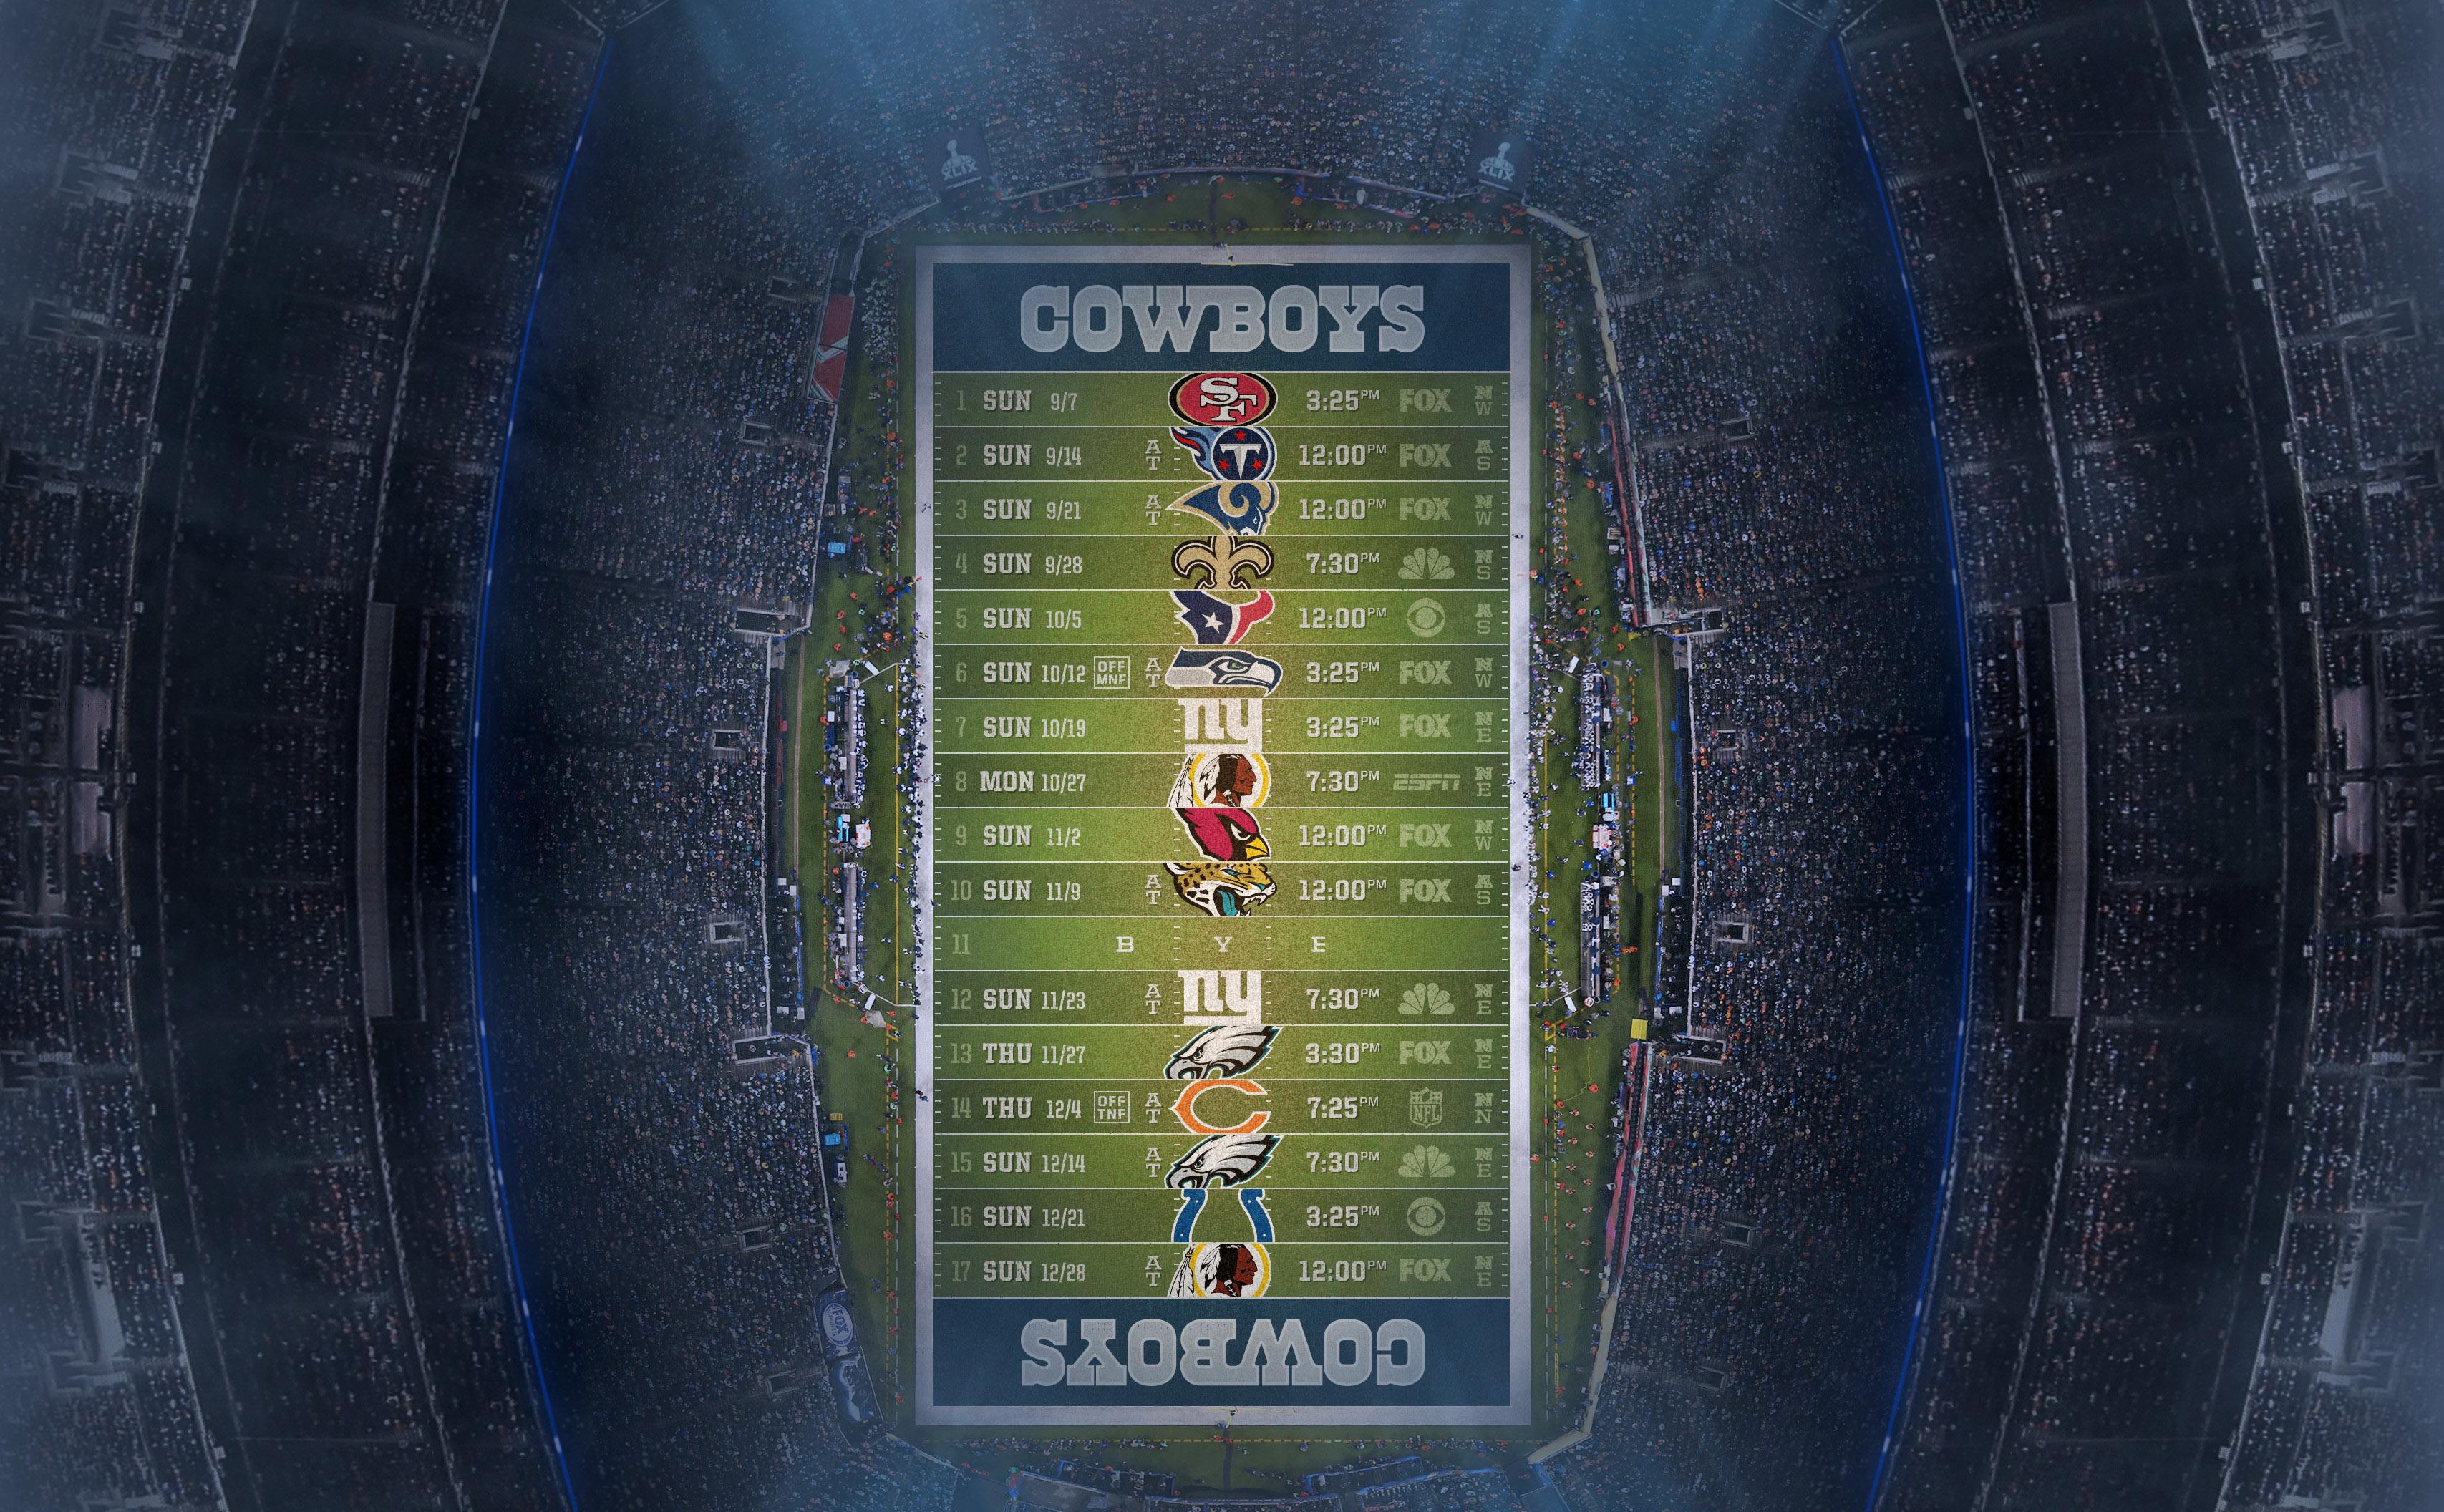 Dallas Cowboys Wallpaper 2014 Players cowboys 2015 schedule wallpaper 3414x2112